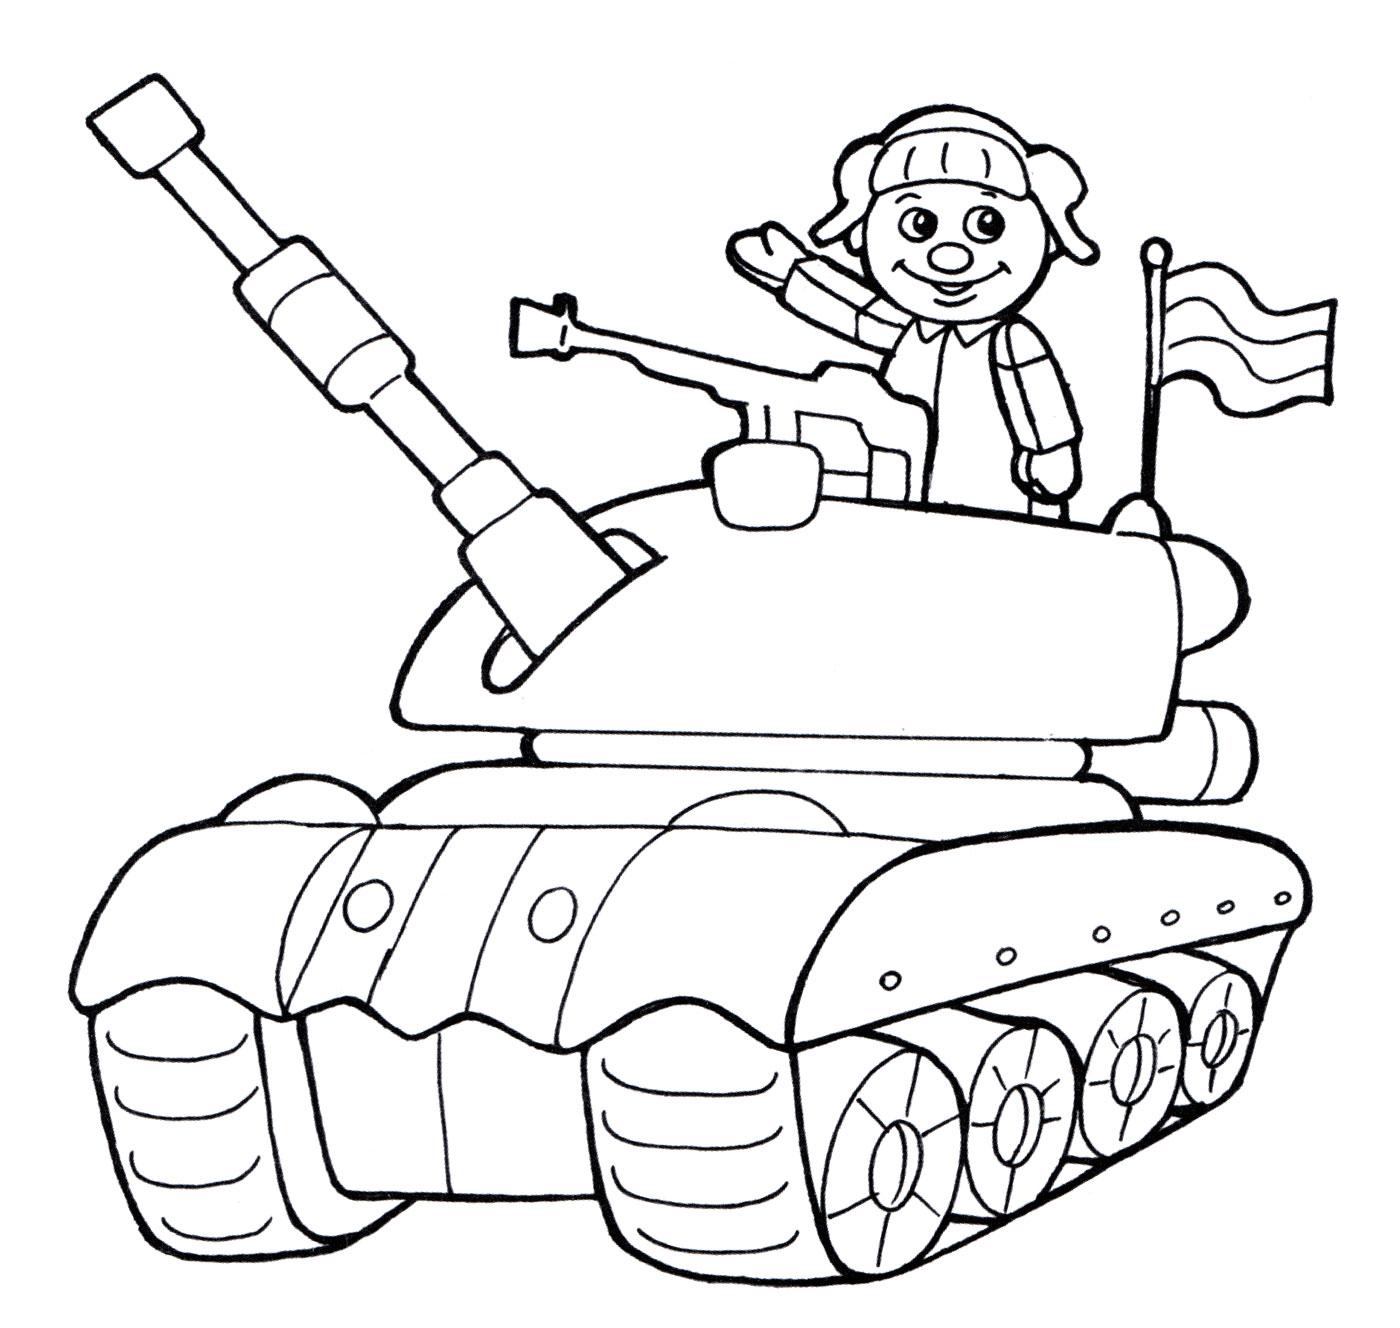 Военная открытка раскраска